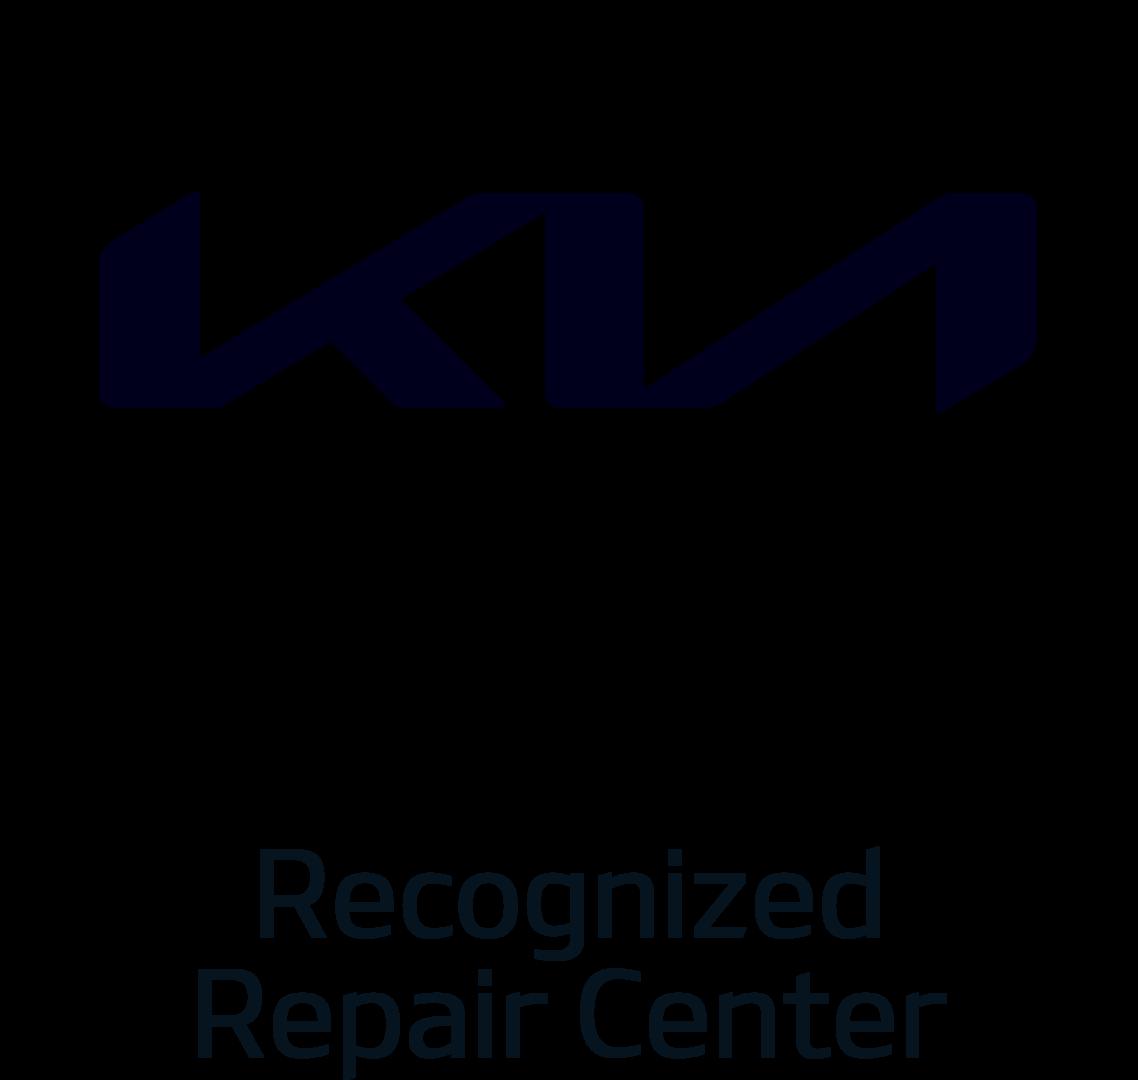 https://secureservercdn.net/50.62.174.189/m7t.e20.myftpupload.com/wp-content/uploads/2021/06/Kia2021-Recognized-Collision-Repair-Center-B-3.png